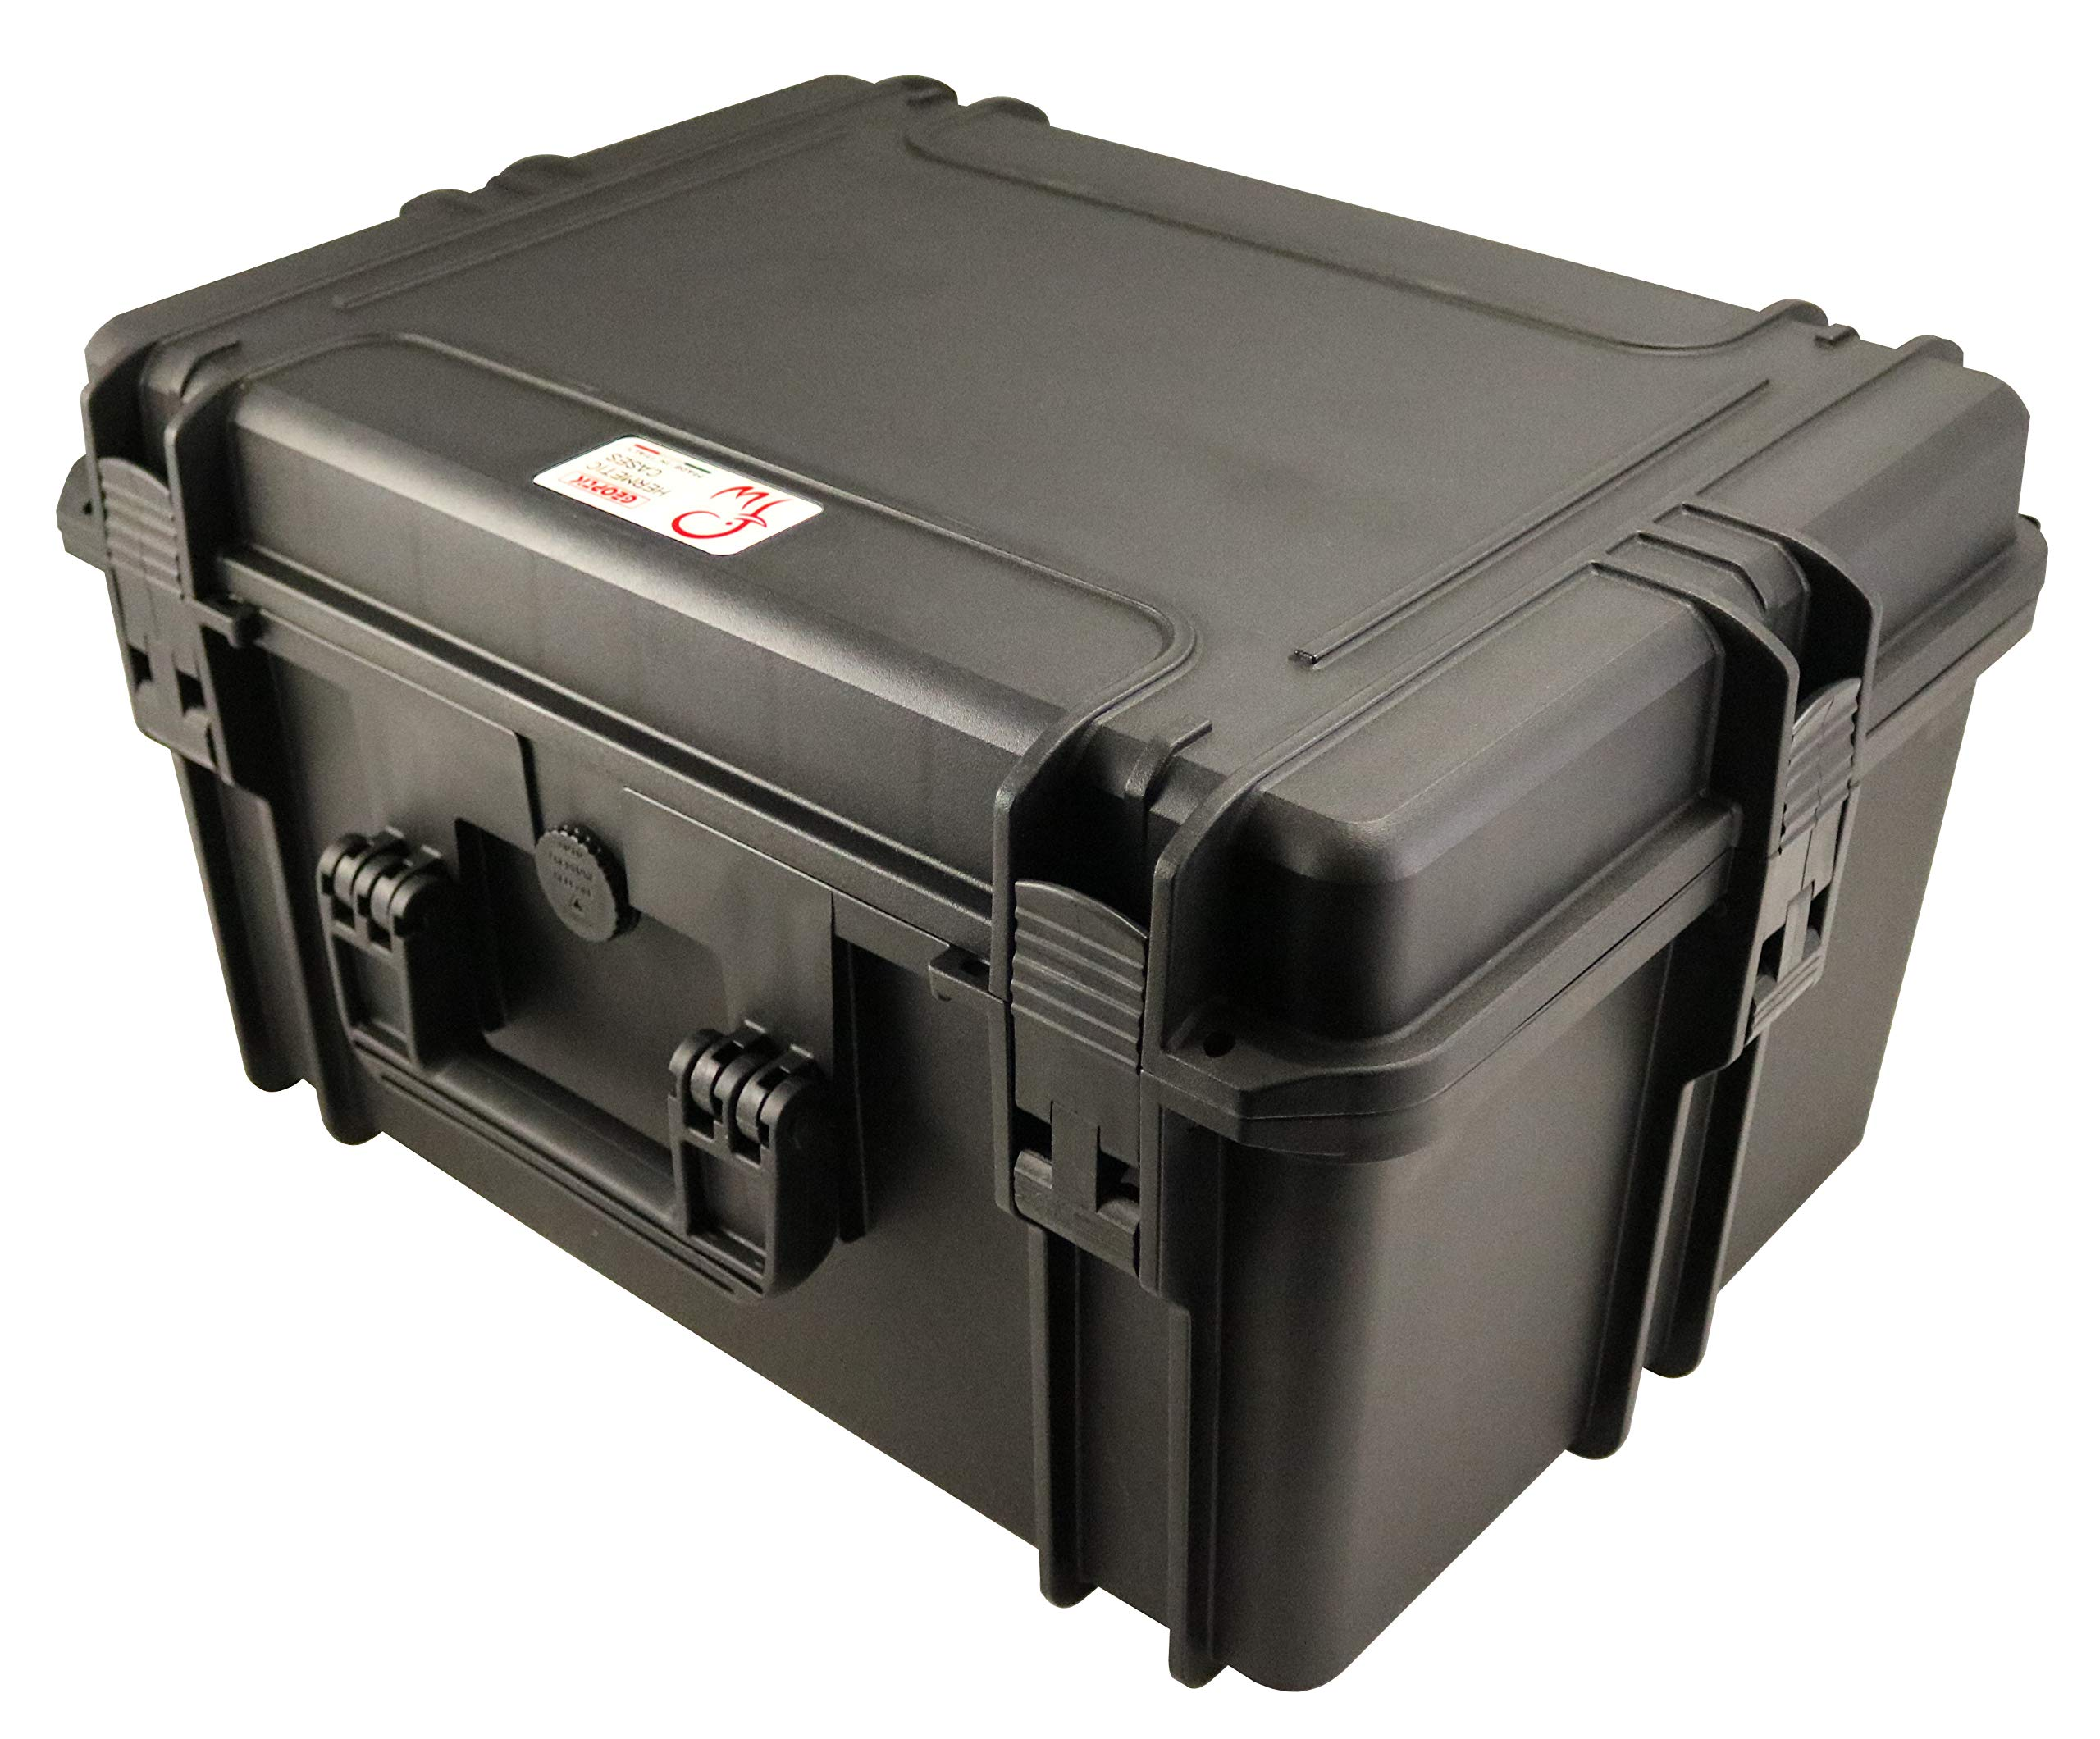 Hermetic airtight 30b052h Luggage Bag by Geoptik